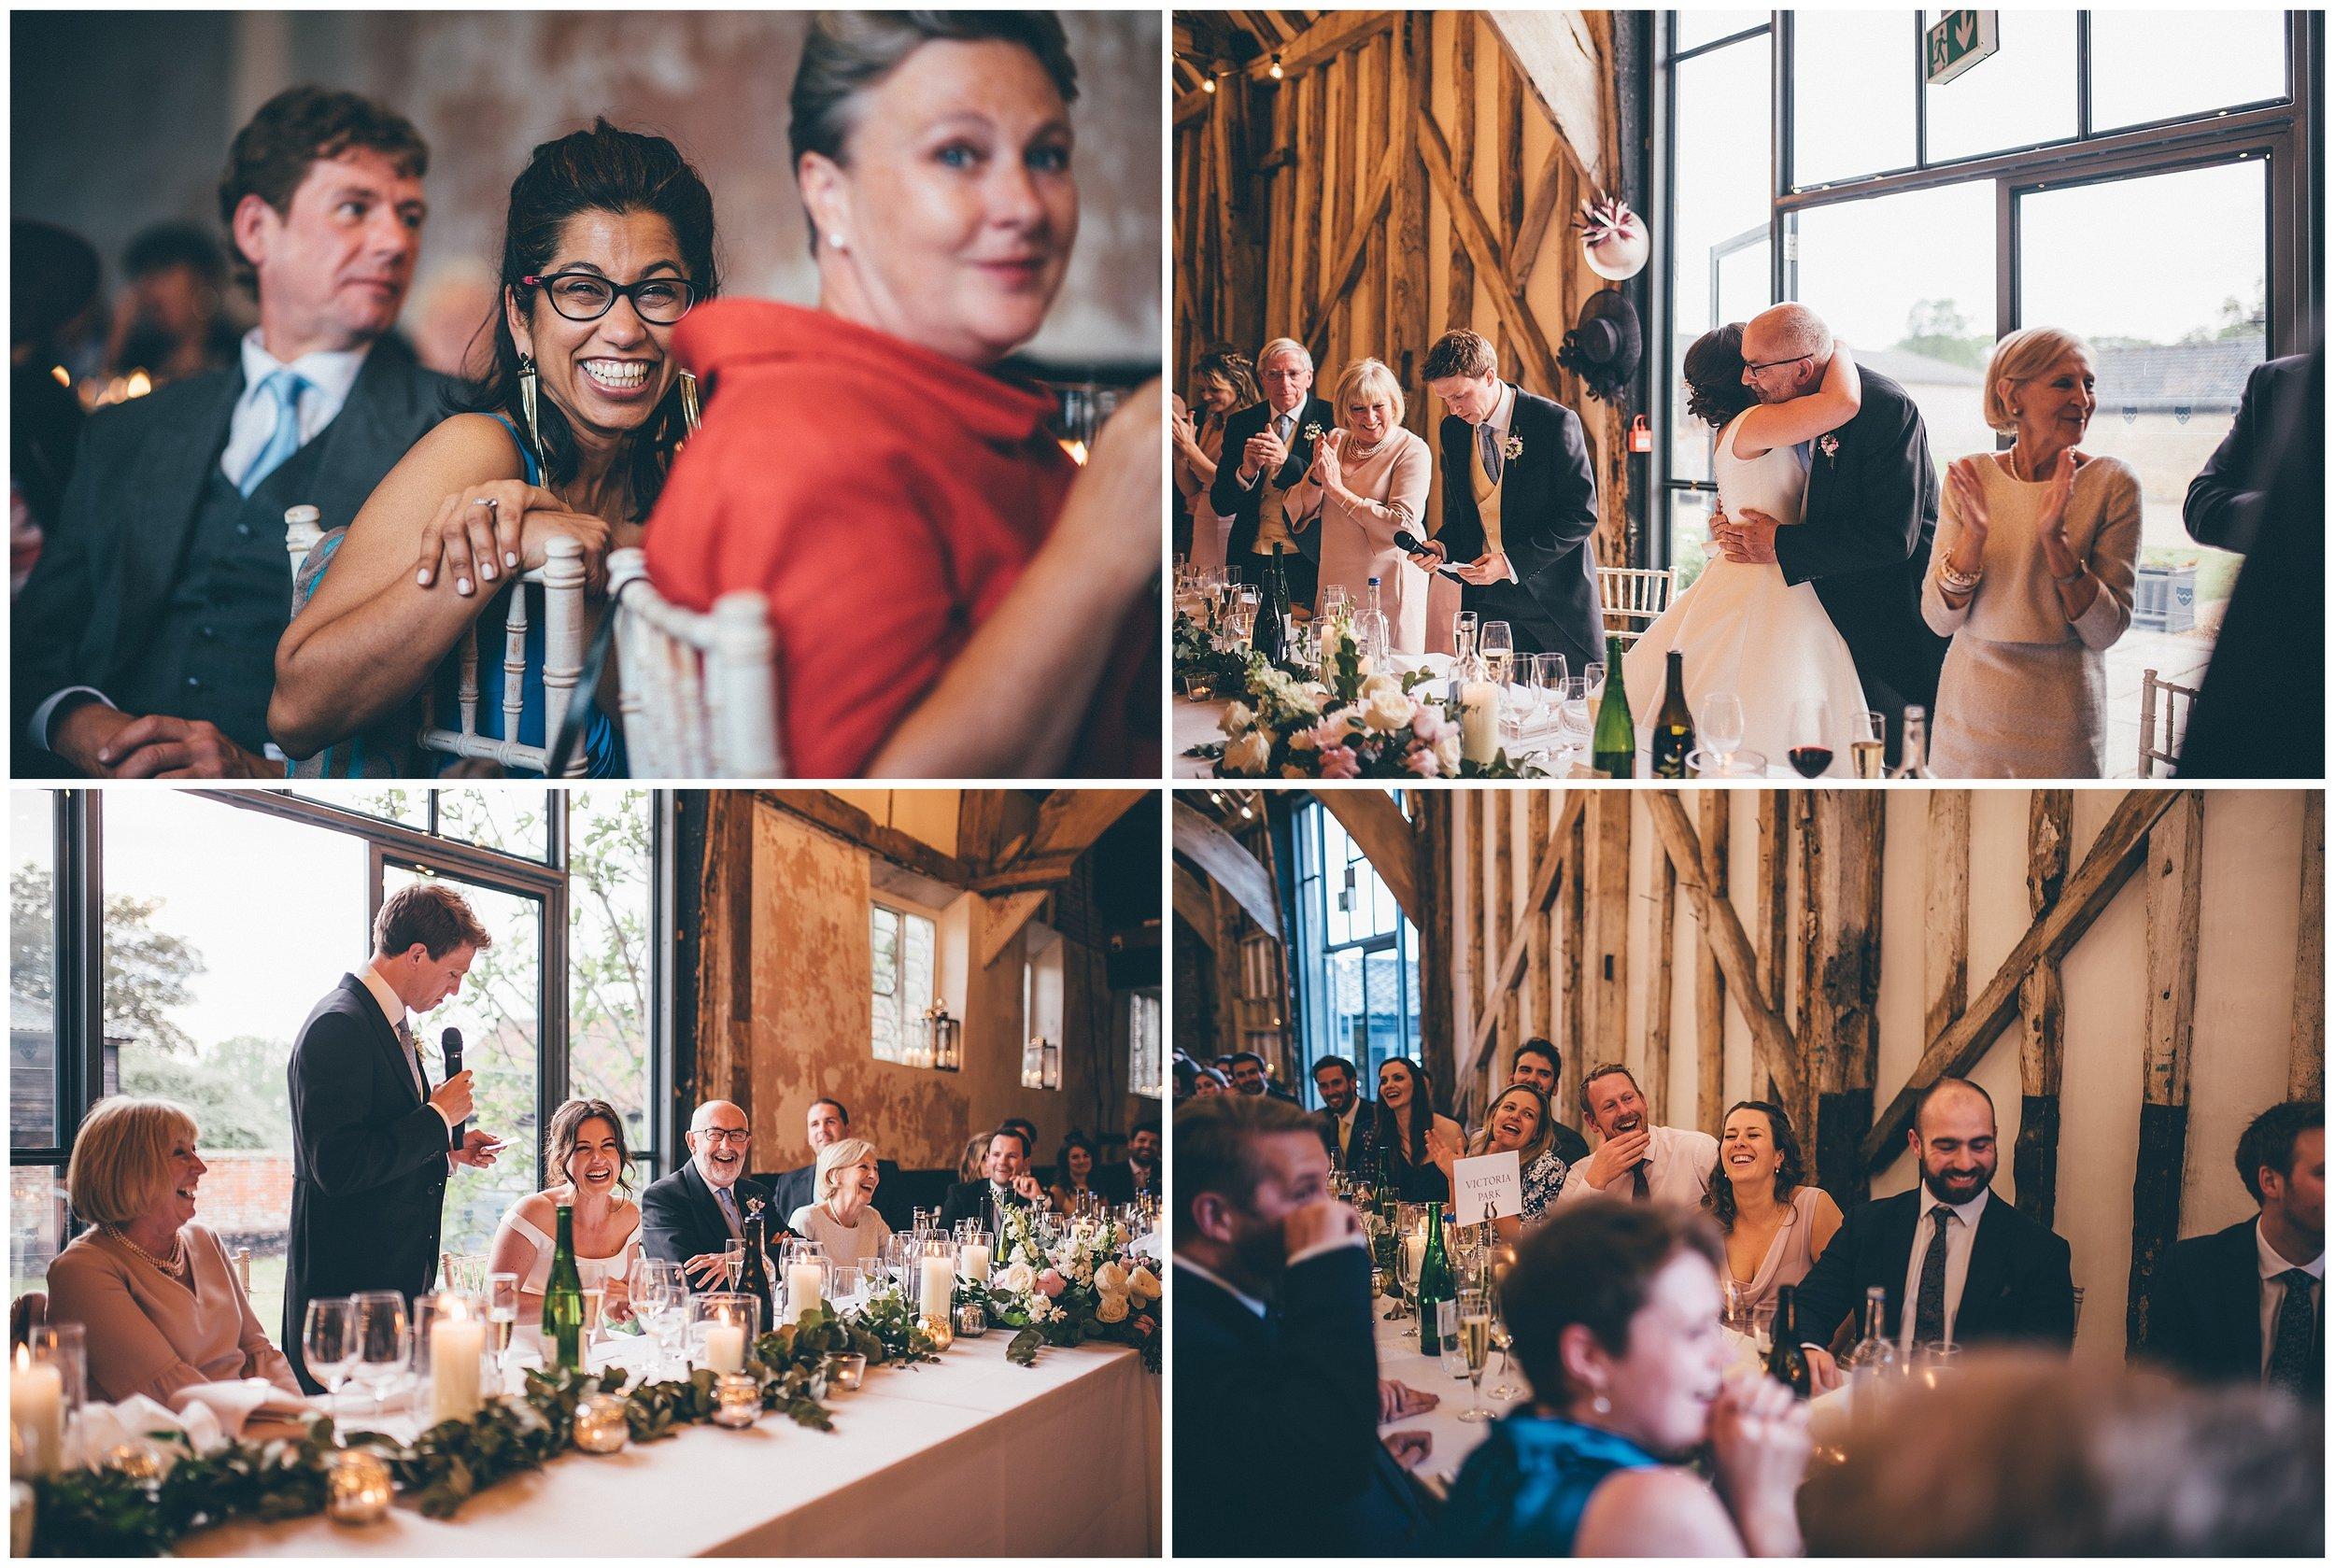 Wedding speeches at Henham Park wedding barns in Southwold.